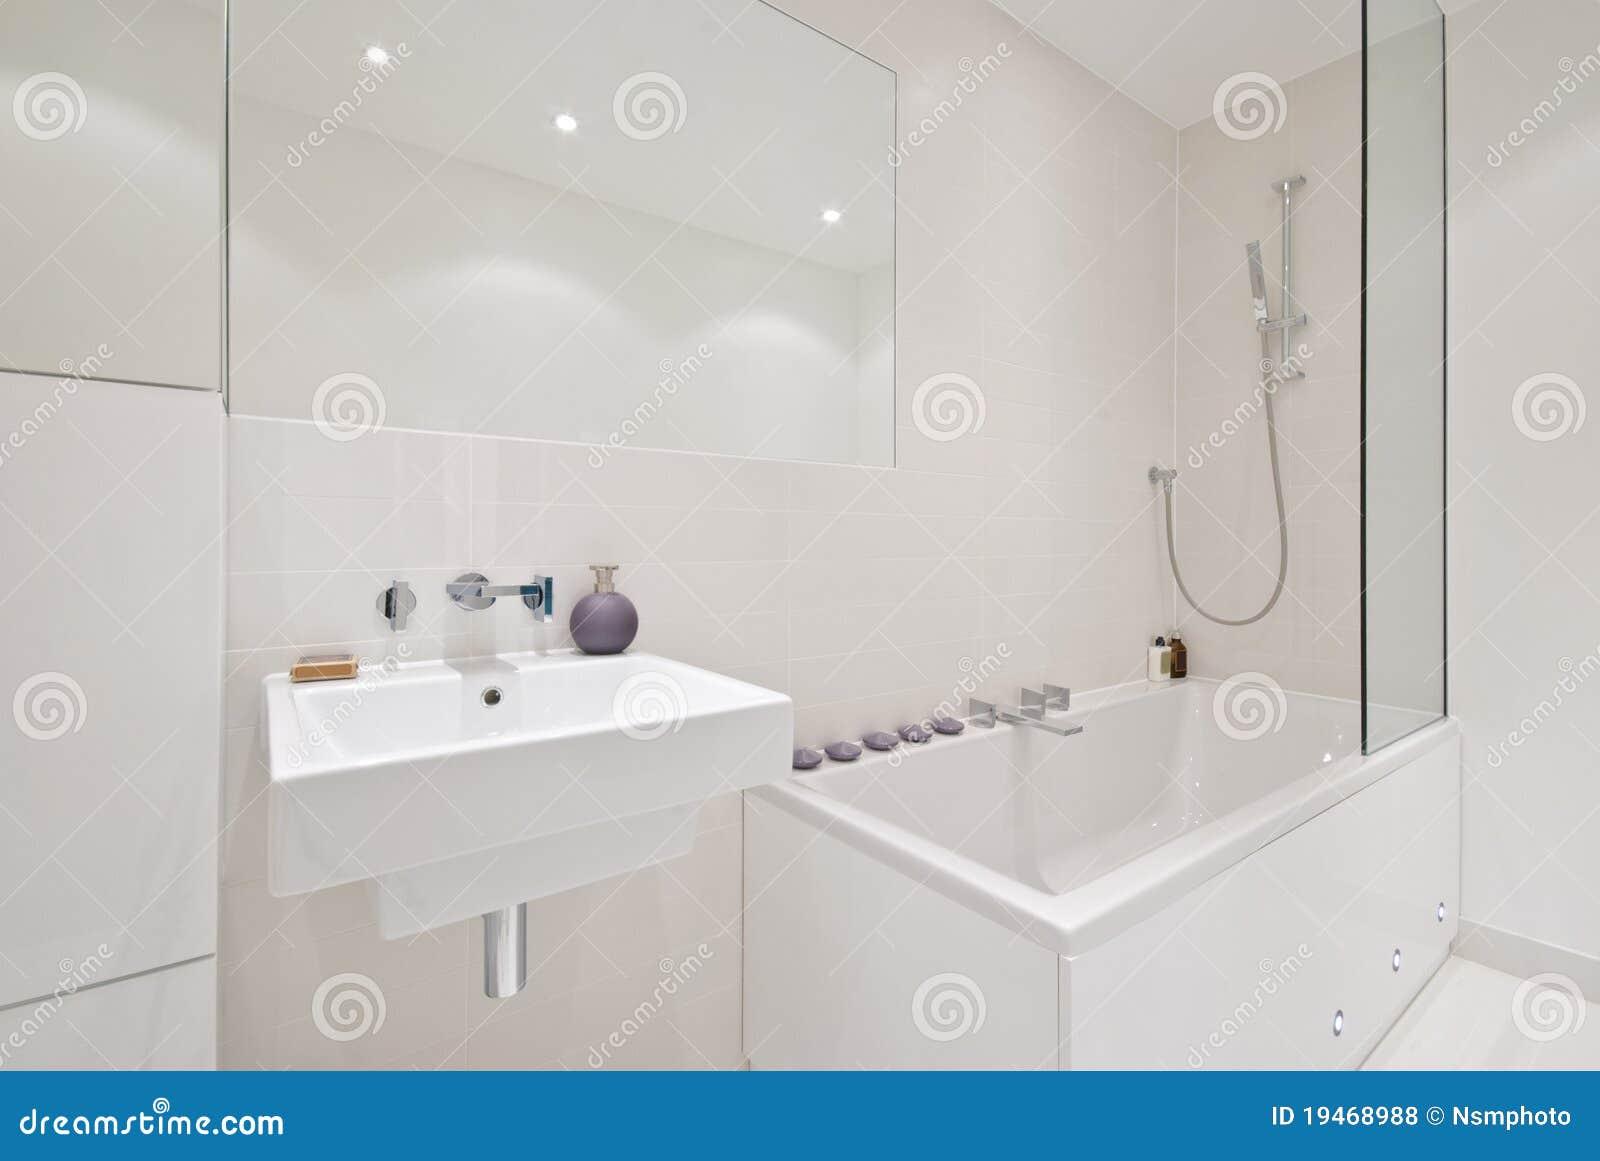 Brand new modern bathroom stock photo image of modern 19468988 for Best bathroom hardware brands